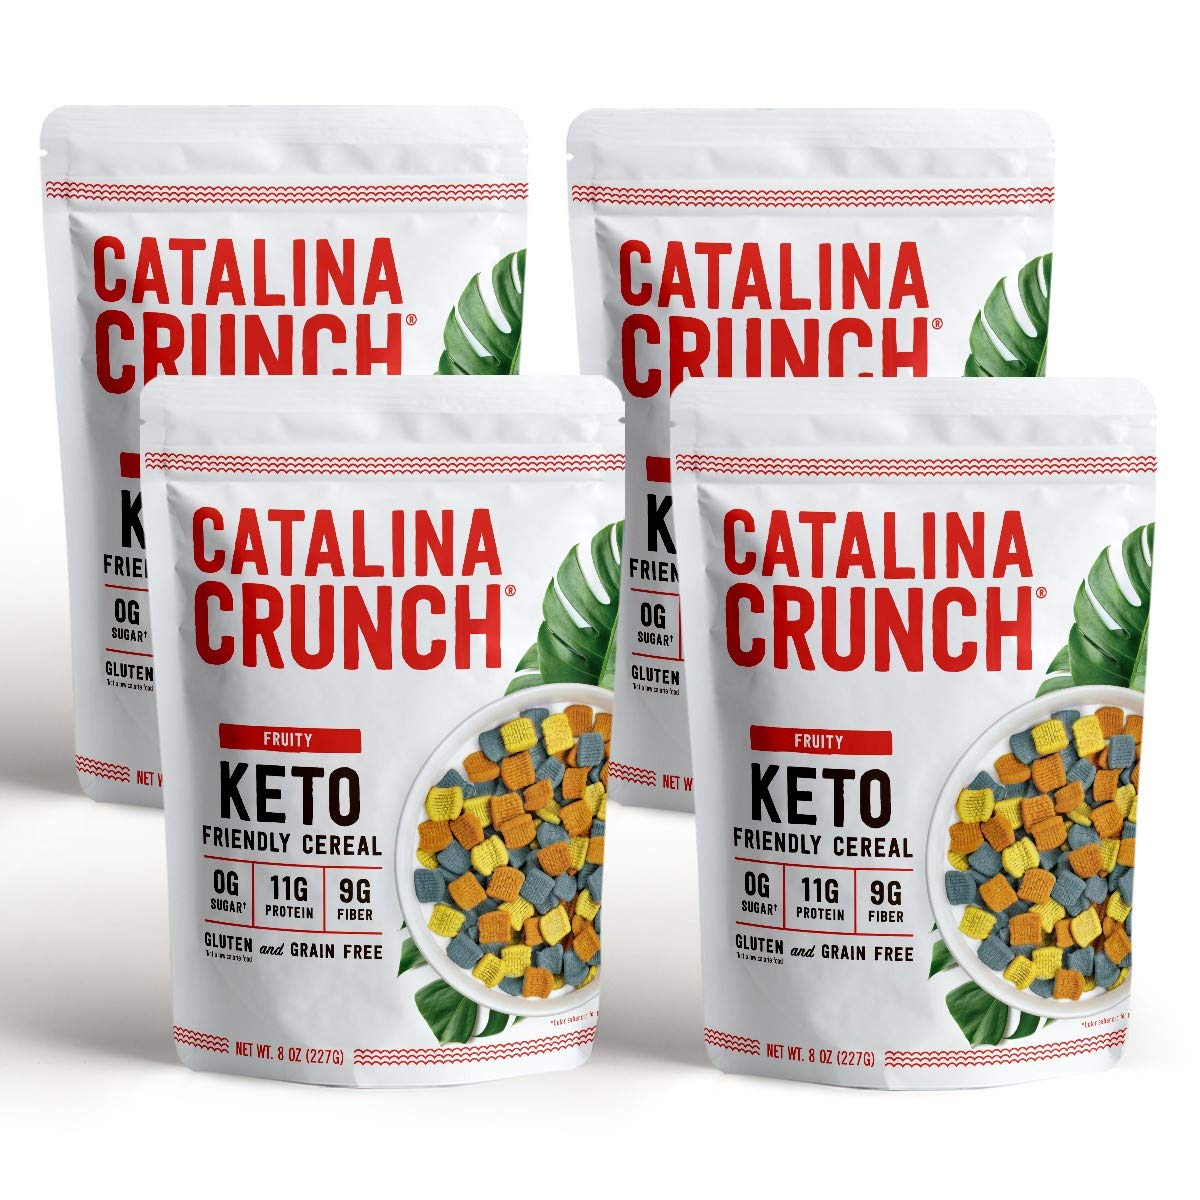 Catalina Crunch Fruity Flavor Keto Cereal (4-Pack): Keto Friendly, Low Carb, Zero Sugar, Plant Protein, High Fiber, Gluten & Grain Free